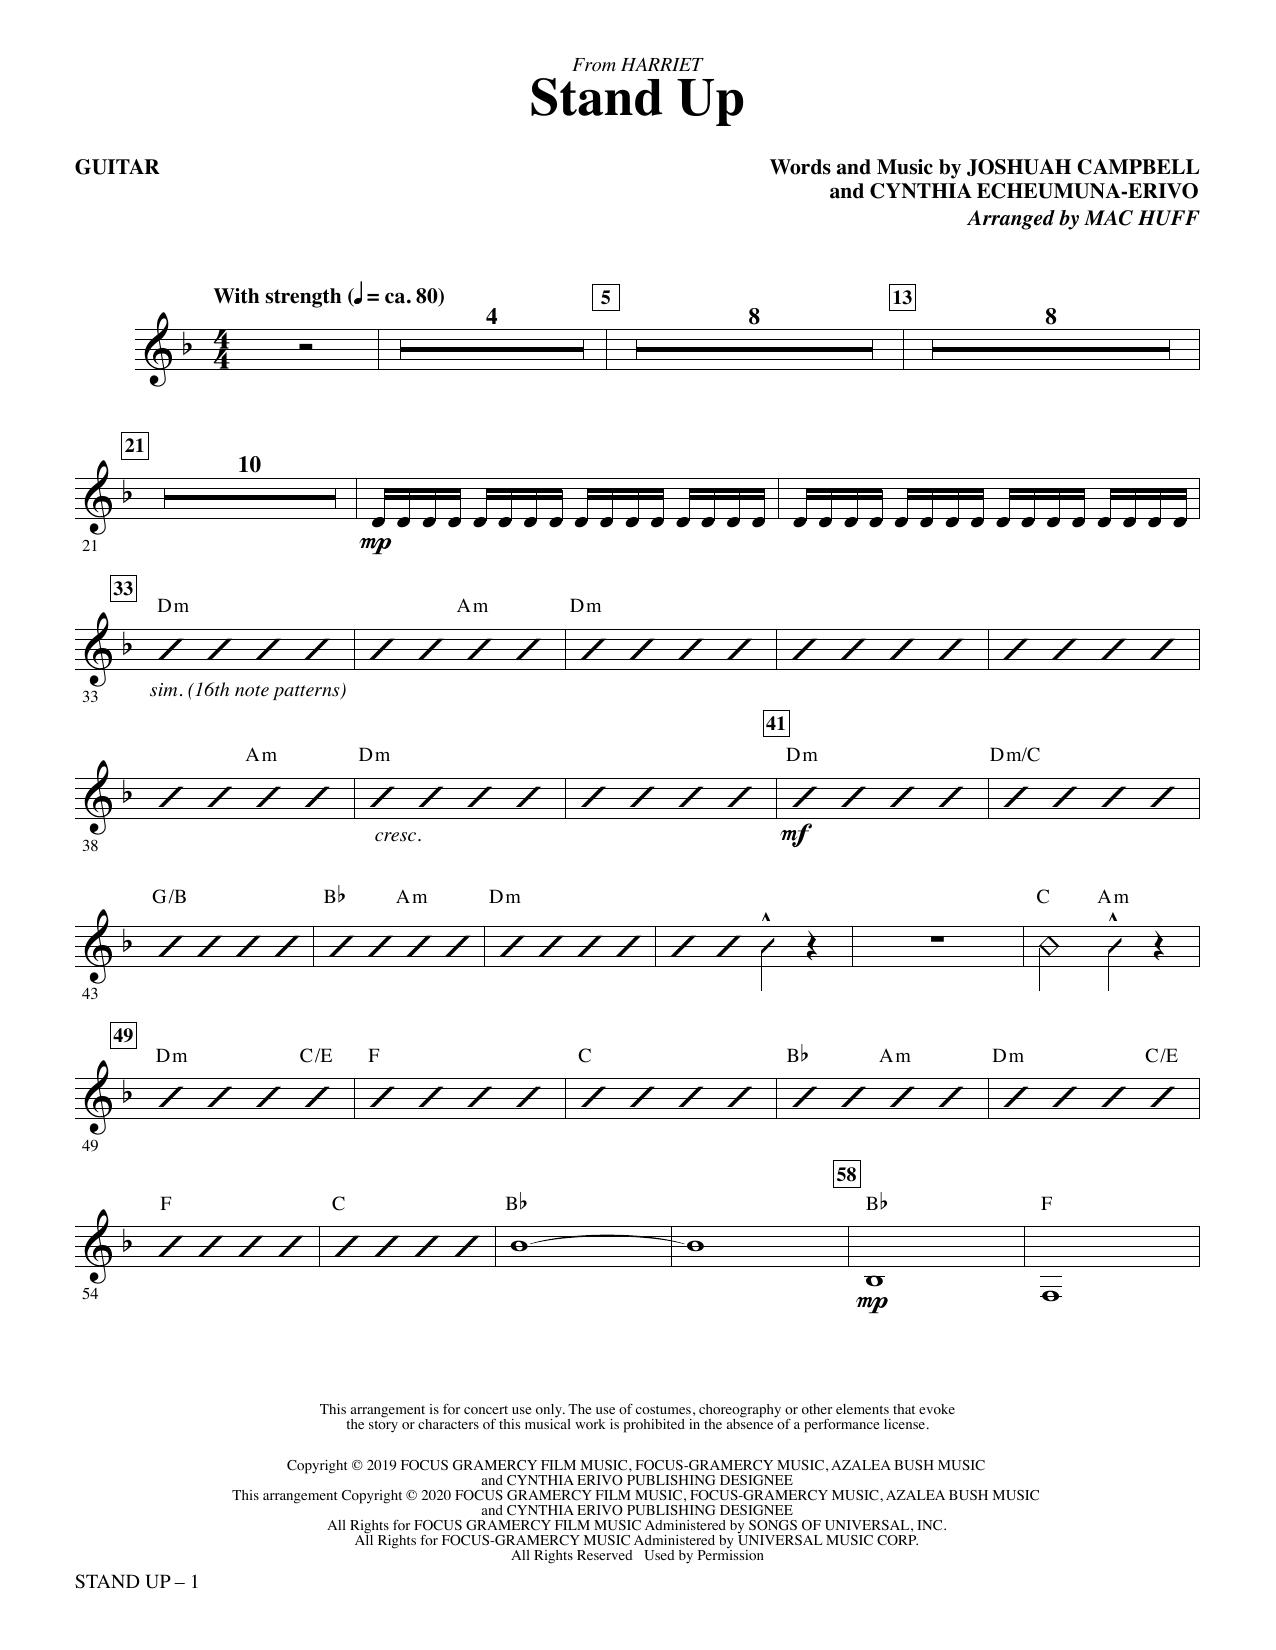 Stand Up (from Harriet) (arr. Mac Huff) - Guitar Partituras Digitales